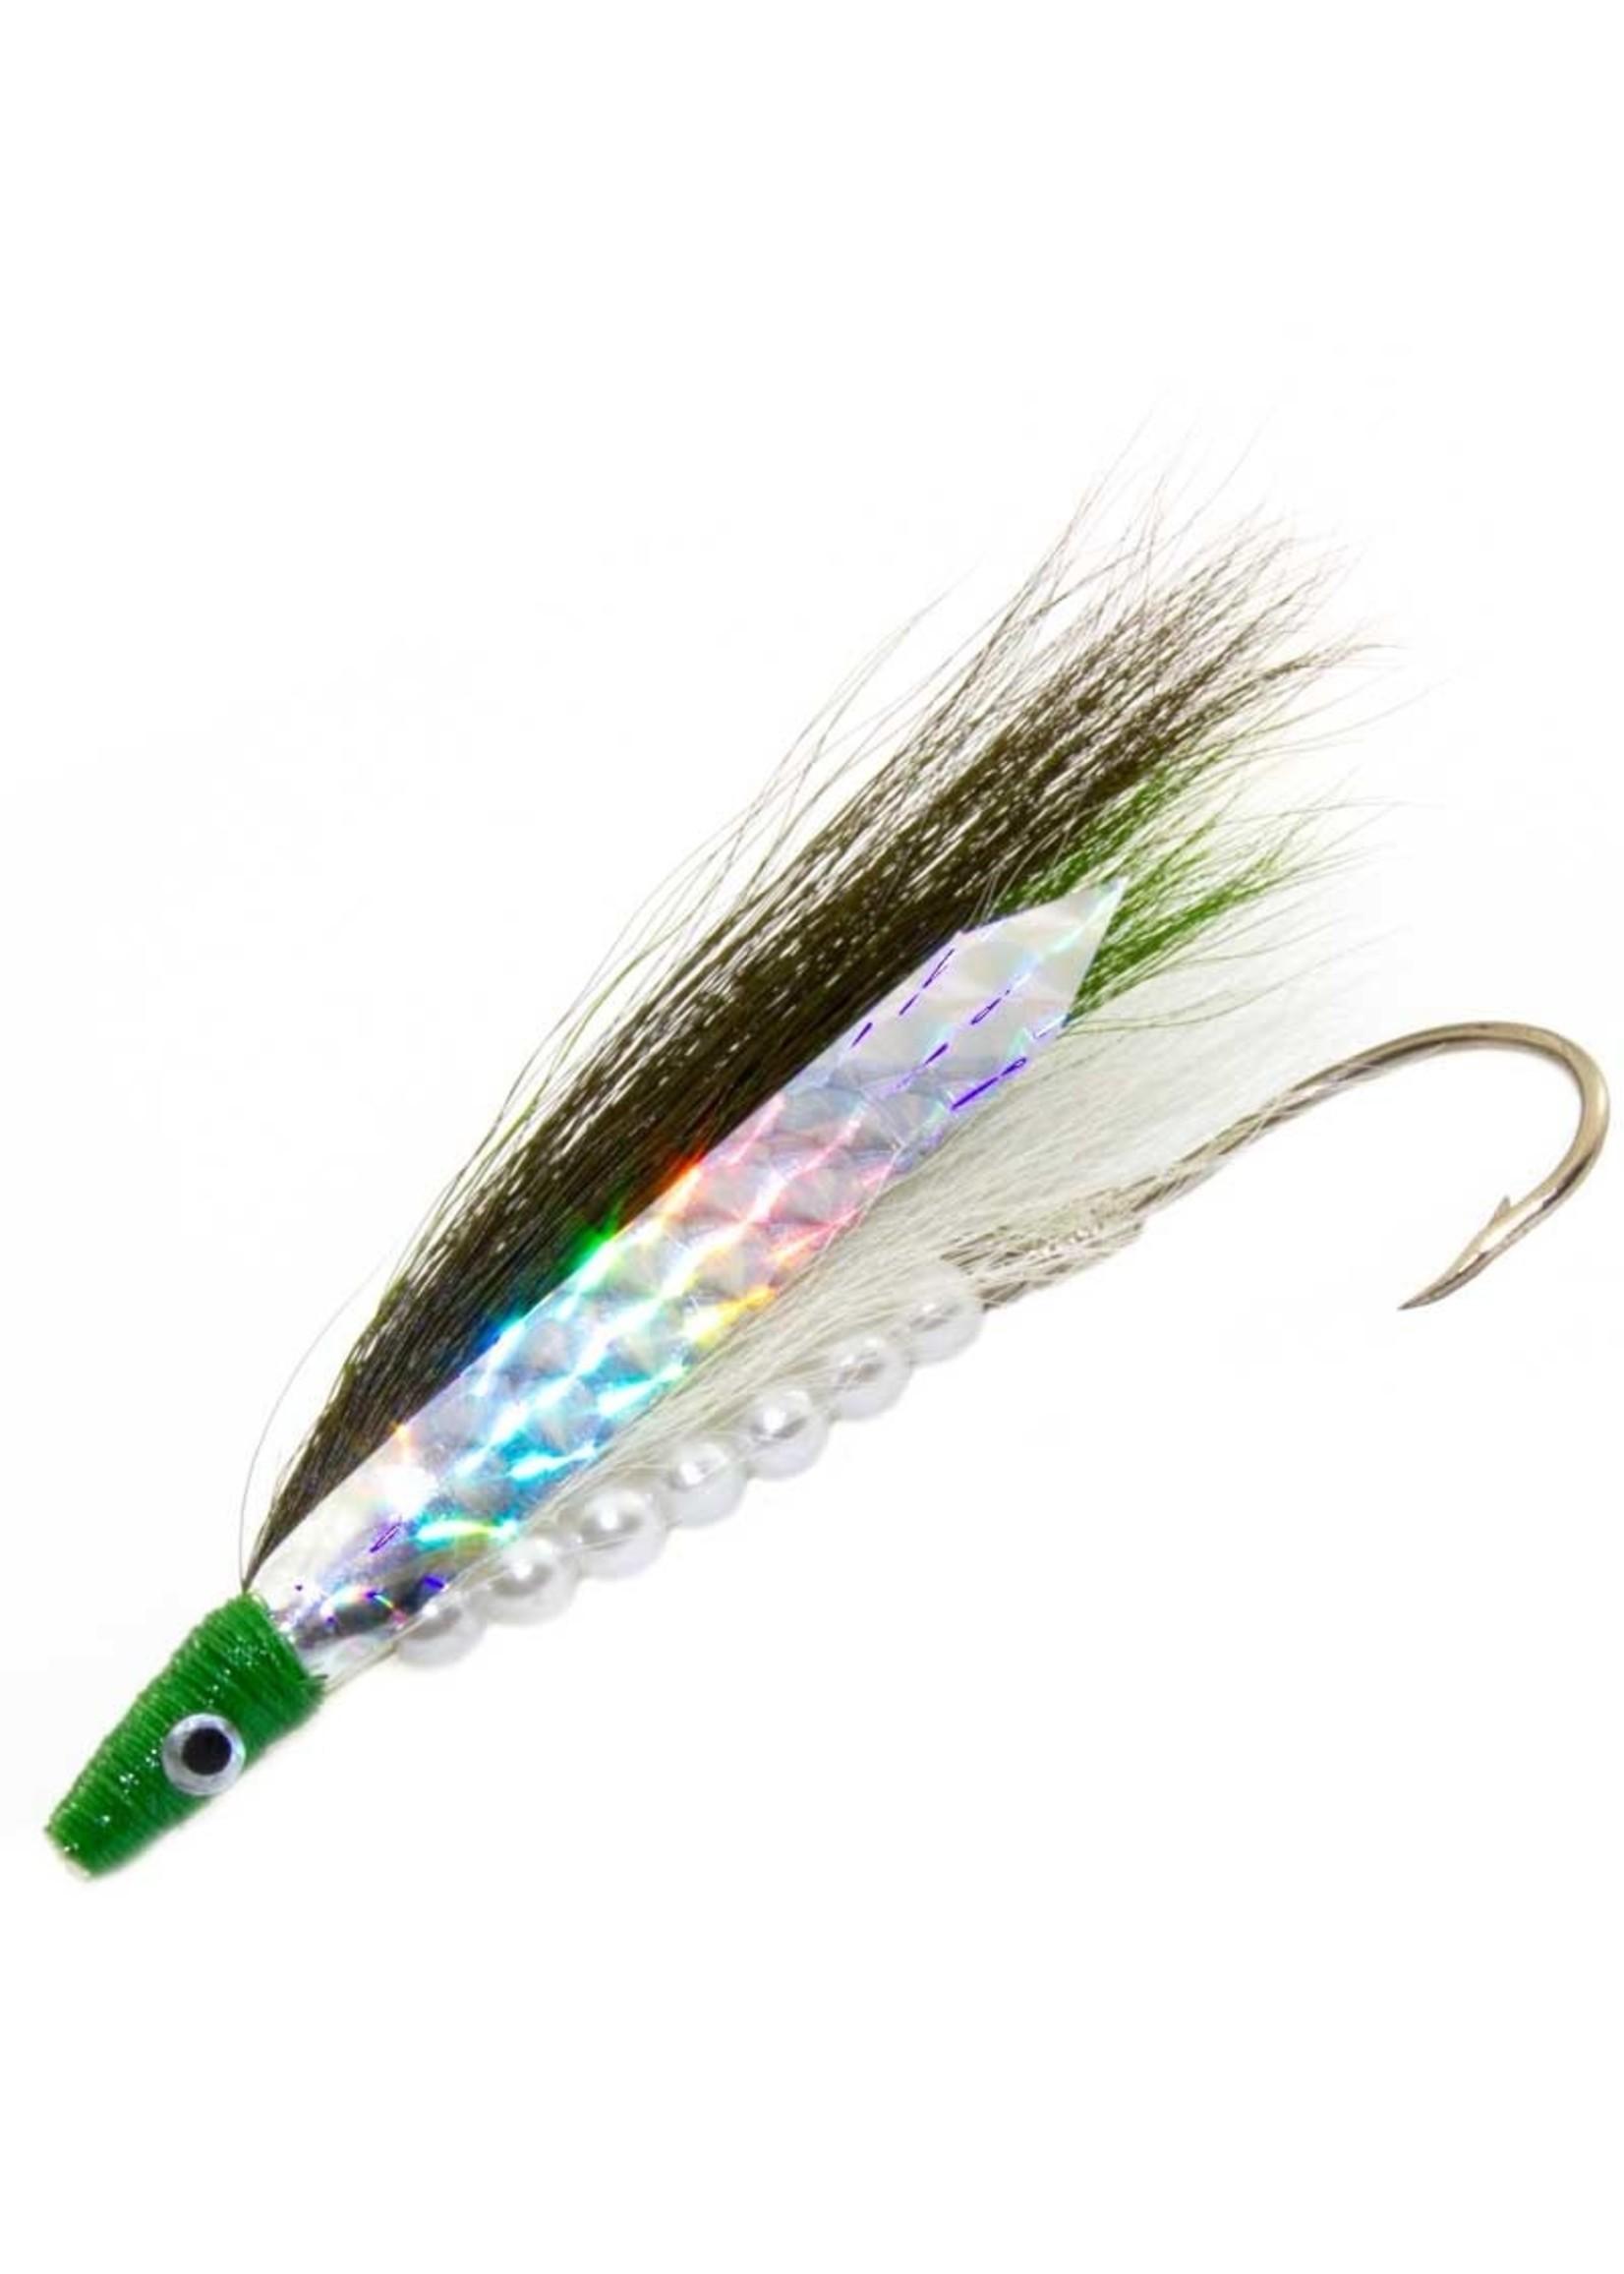 ZAK TACKLE Salmon Fly